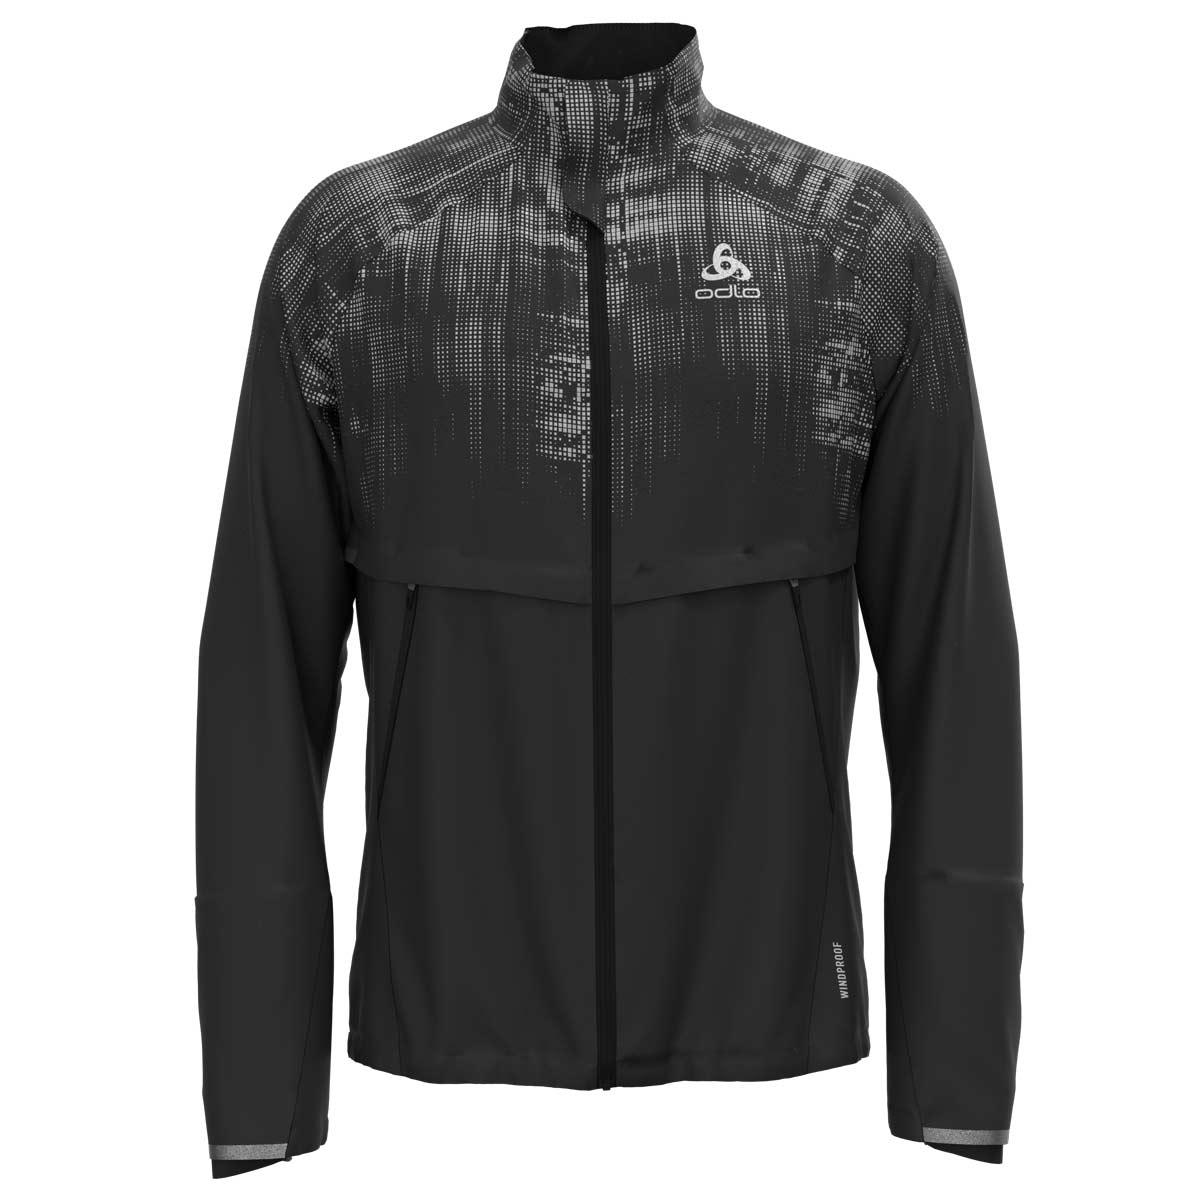 Odlo Men's ZEROWEIGHT PRO WARM REFLECT Jacket 322622 - 60239 black - reflective graphic